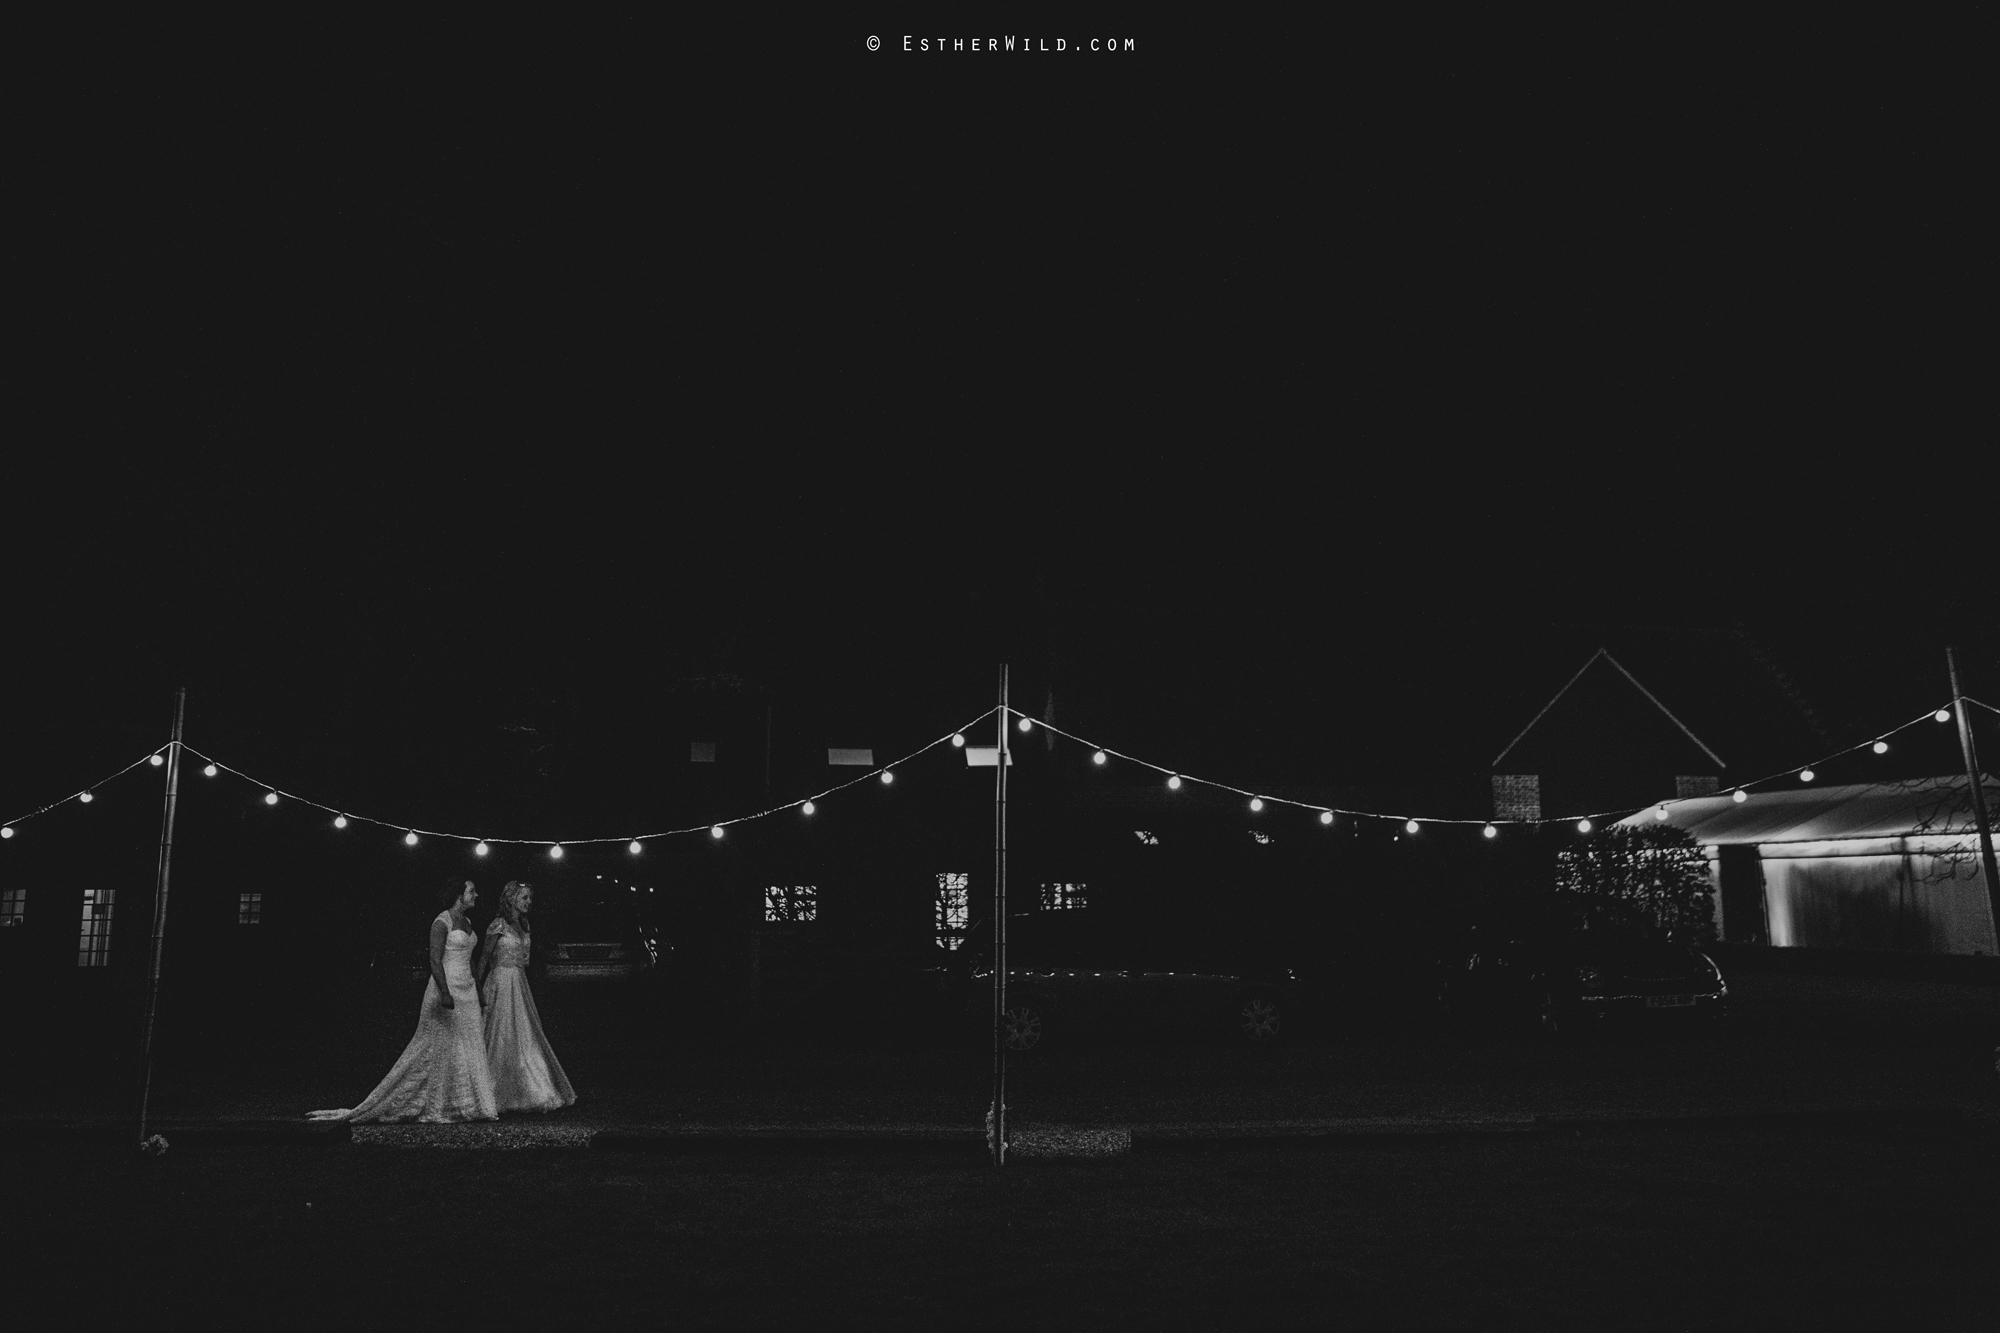 Elms_Barn_Weddings_Suffolk_Photographer_Copyright_Esther_Wild_IMG_3162.jpg